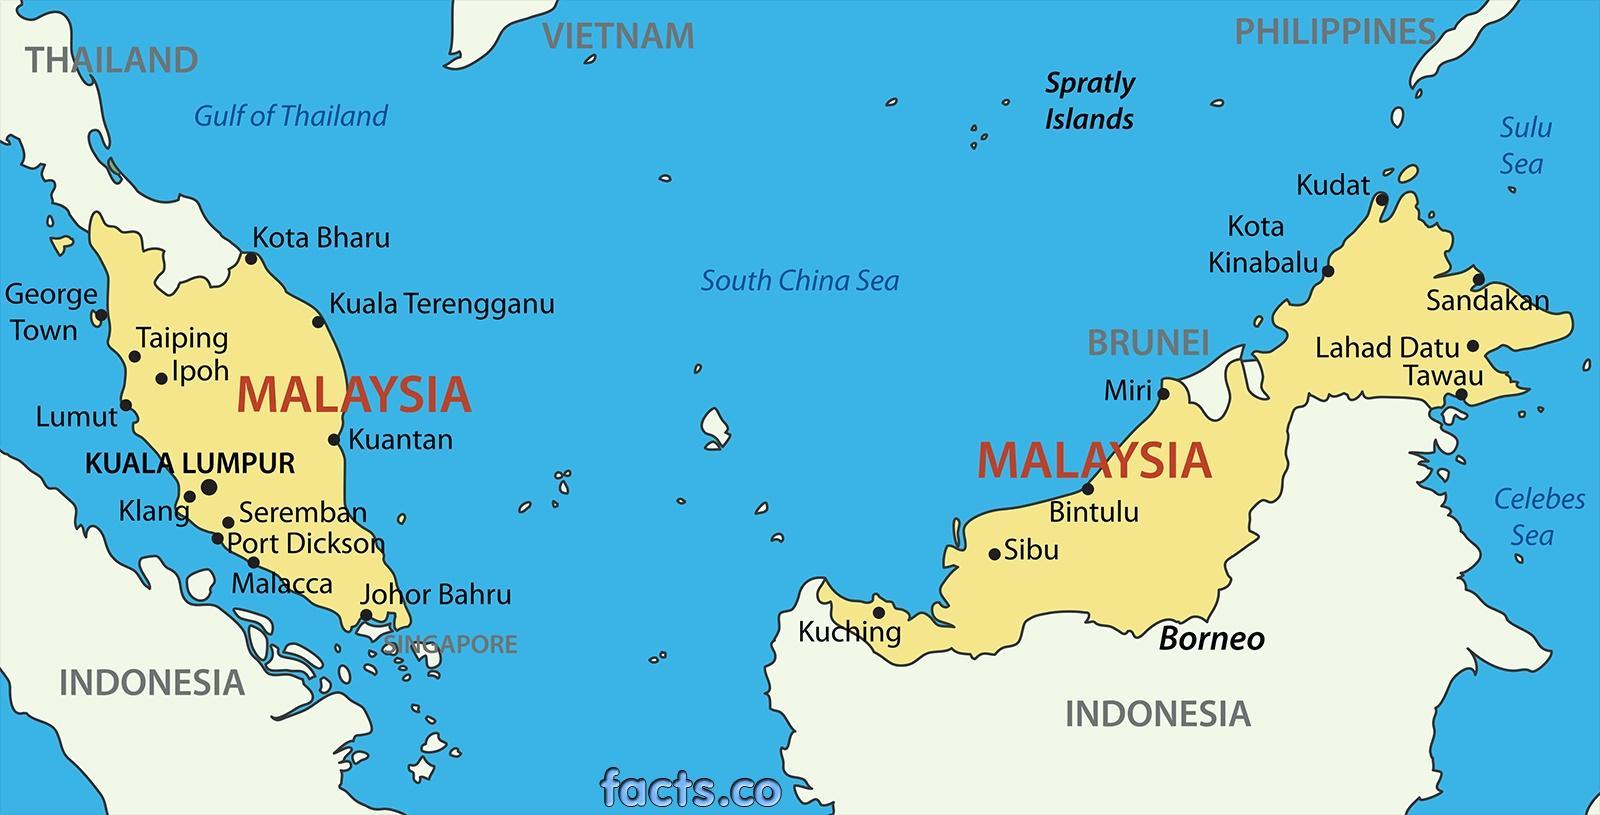 Malaysia Kort Et Kort Over Malaysia Syd Ostlige Asien Asien